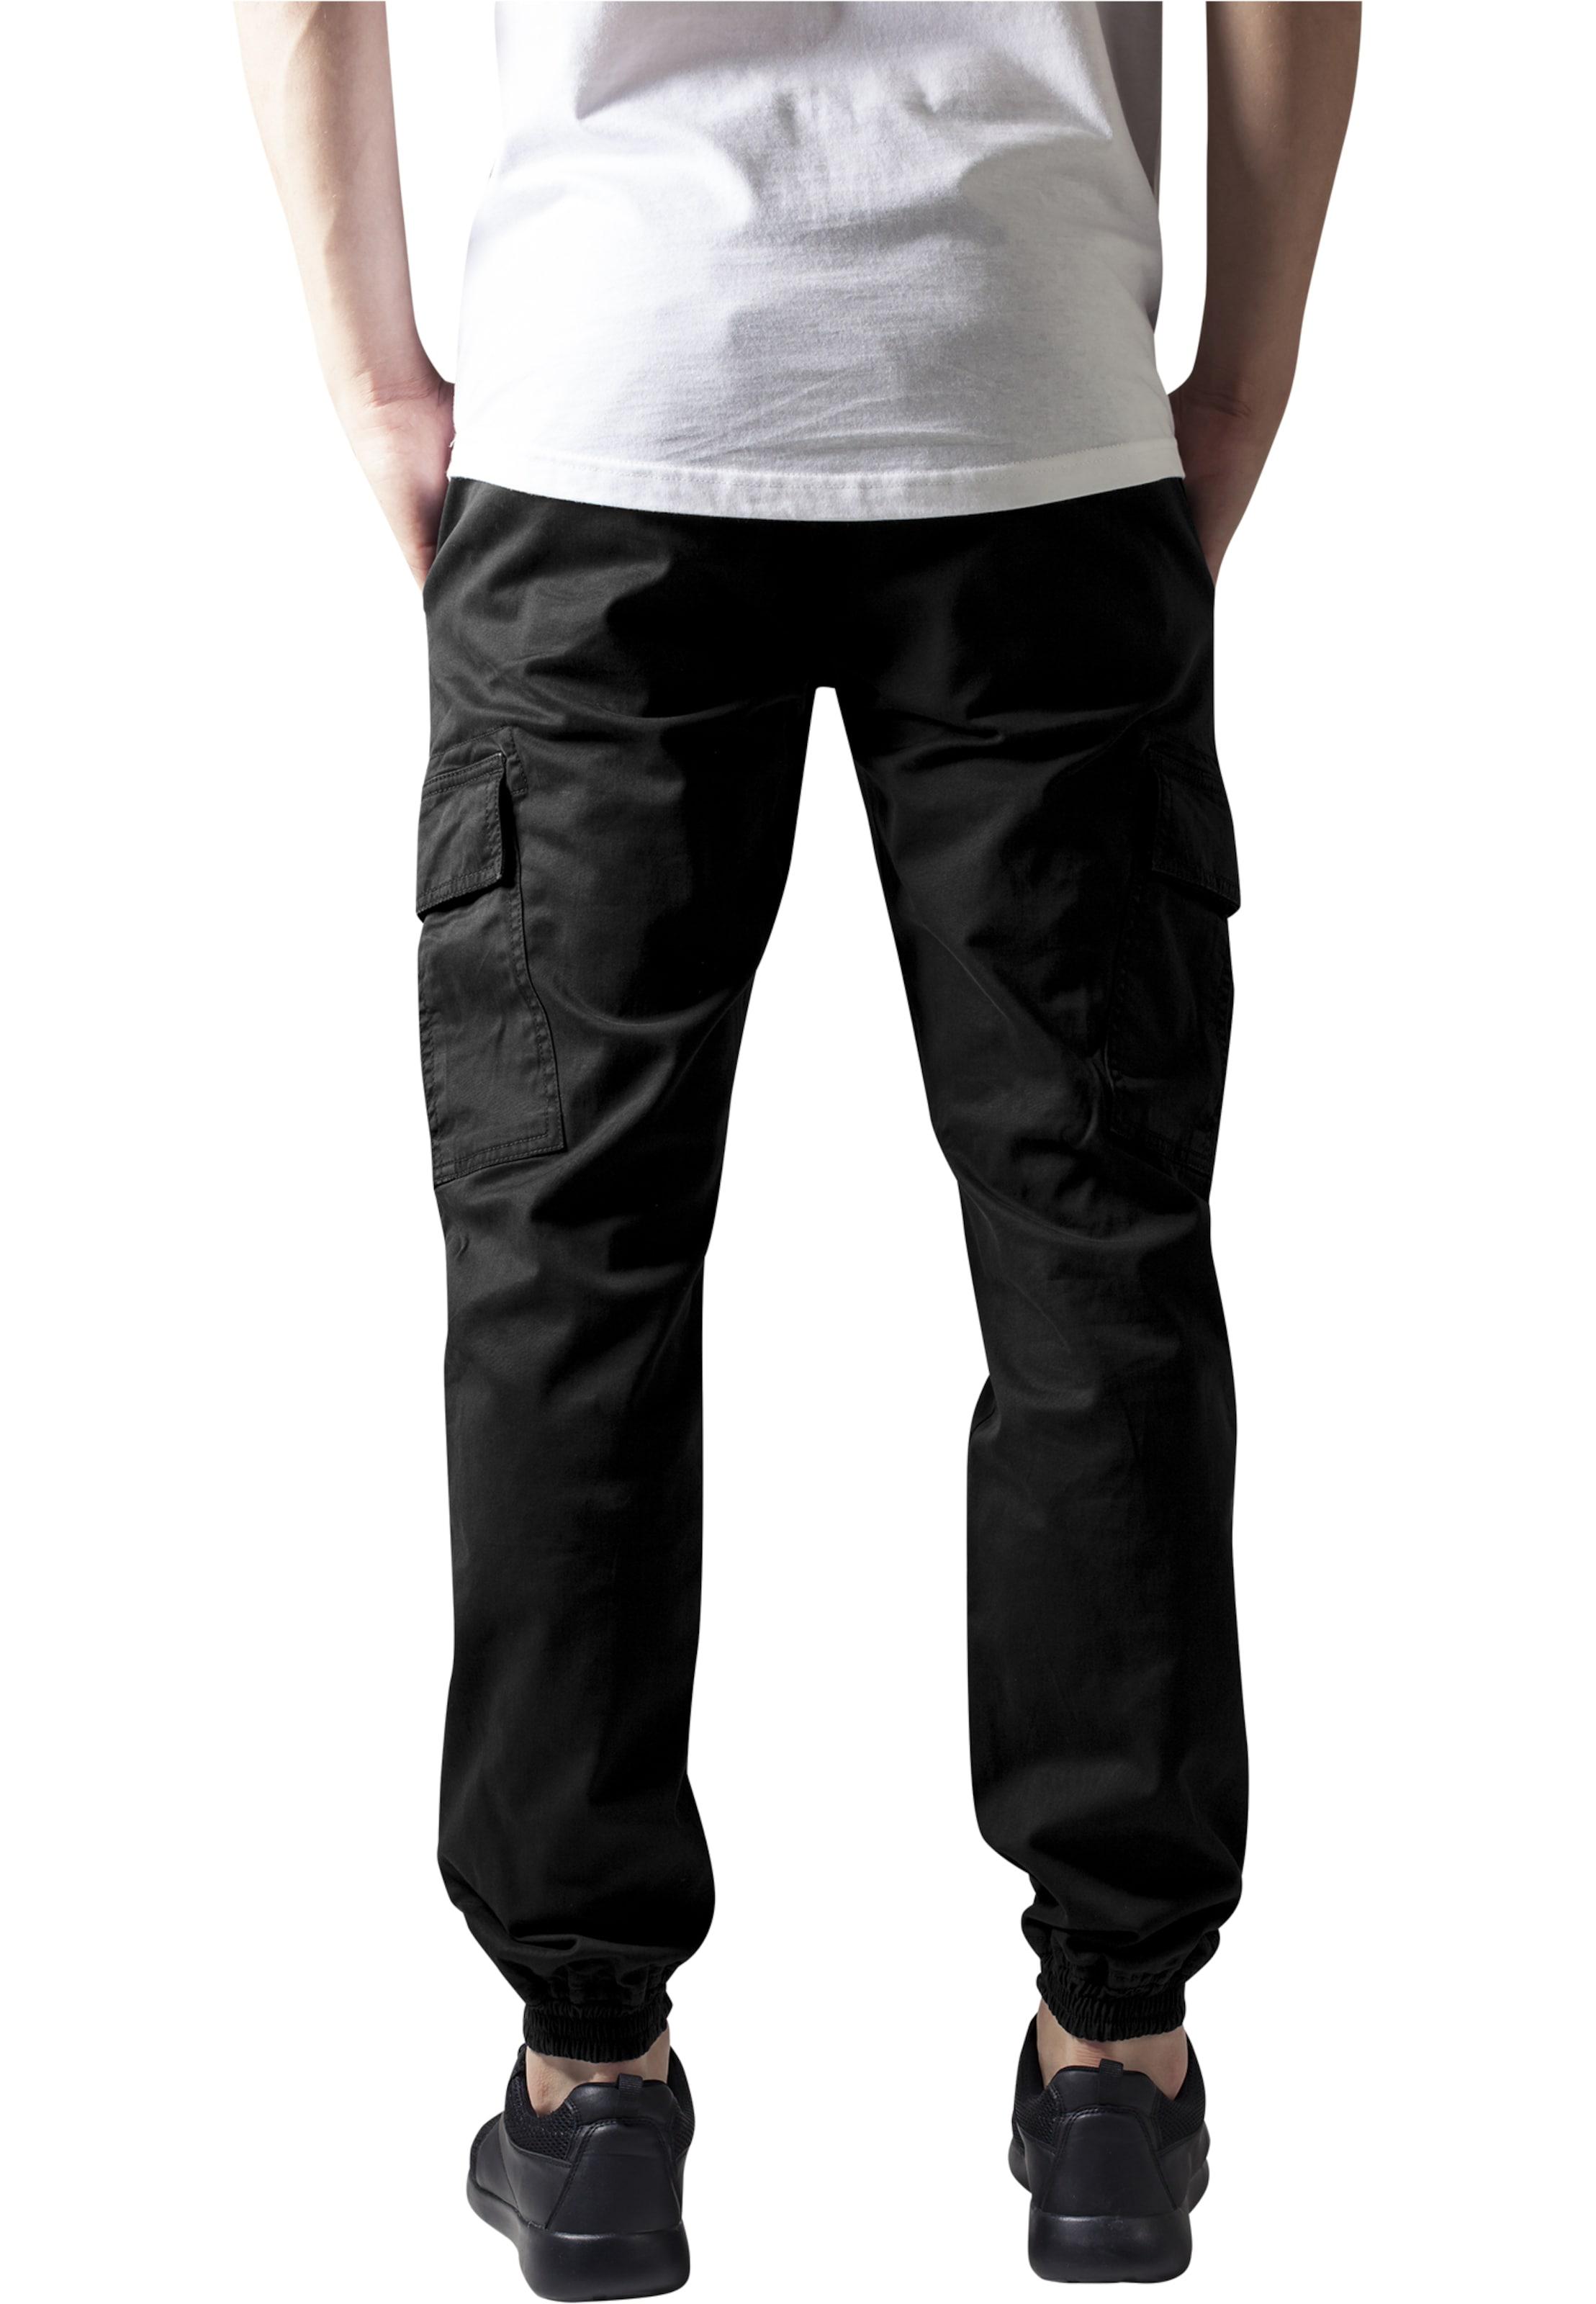 Pants Urban Cargo In Schwarz Classics 0P8nwOk